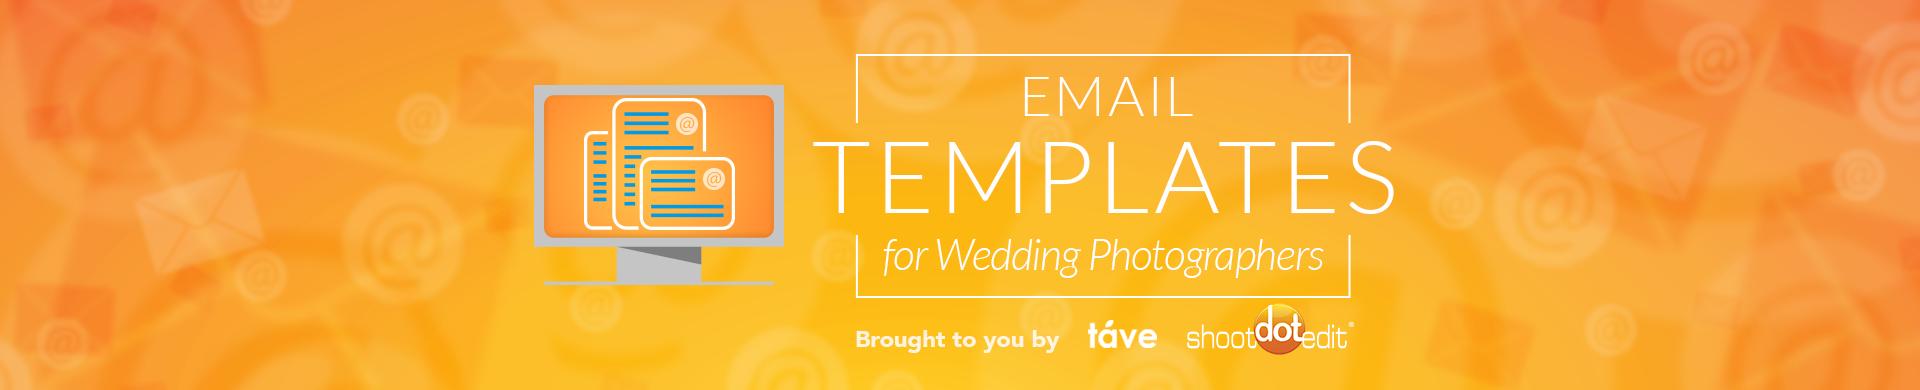 EmailTemplatesGuide_Header